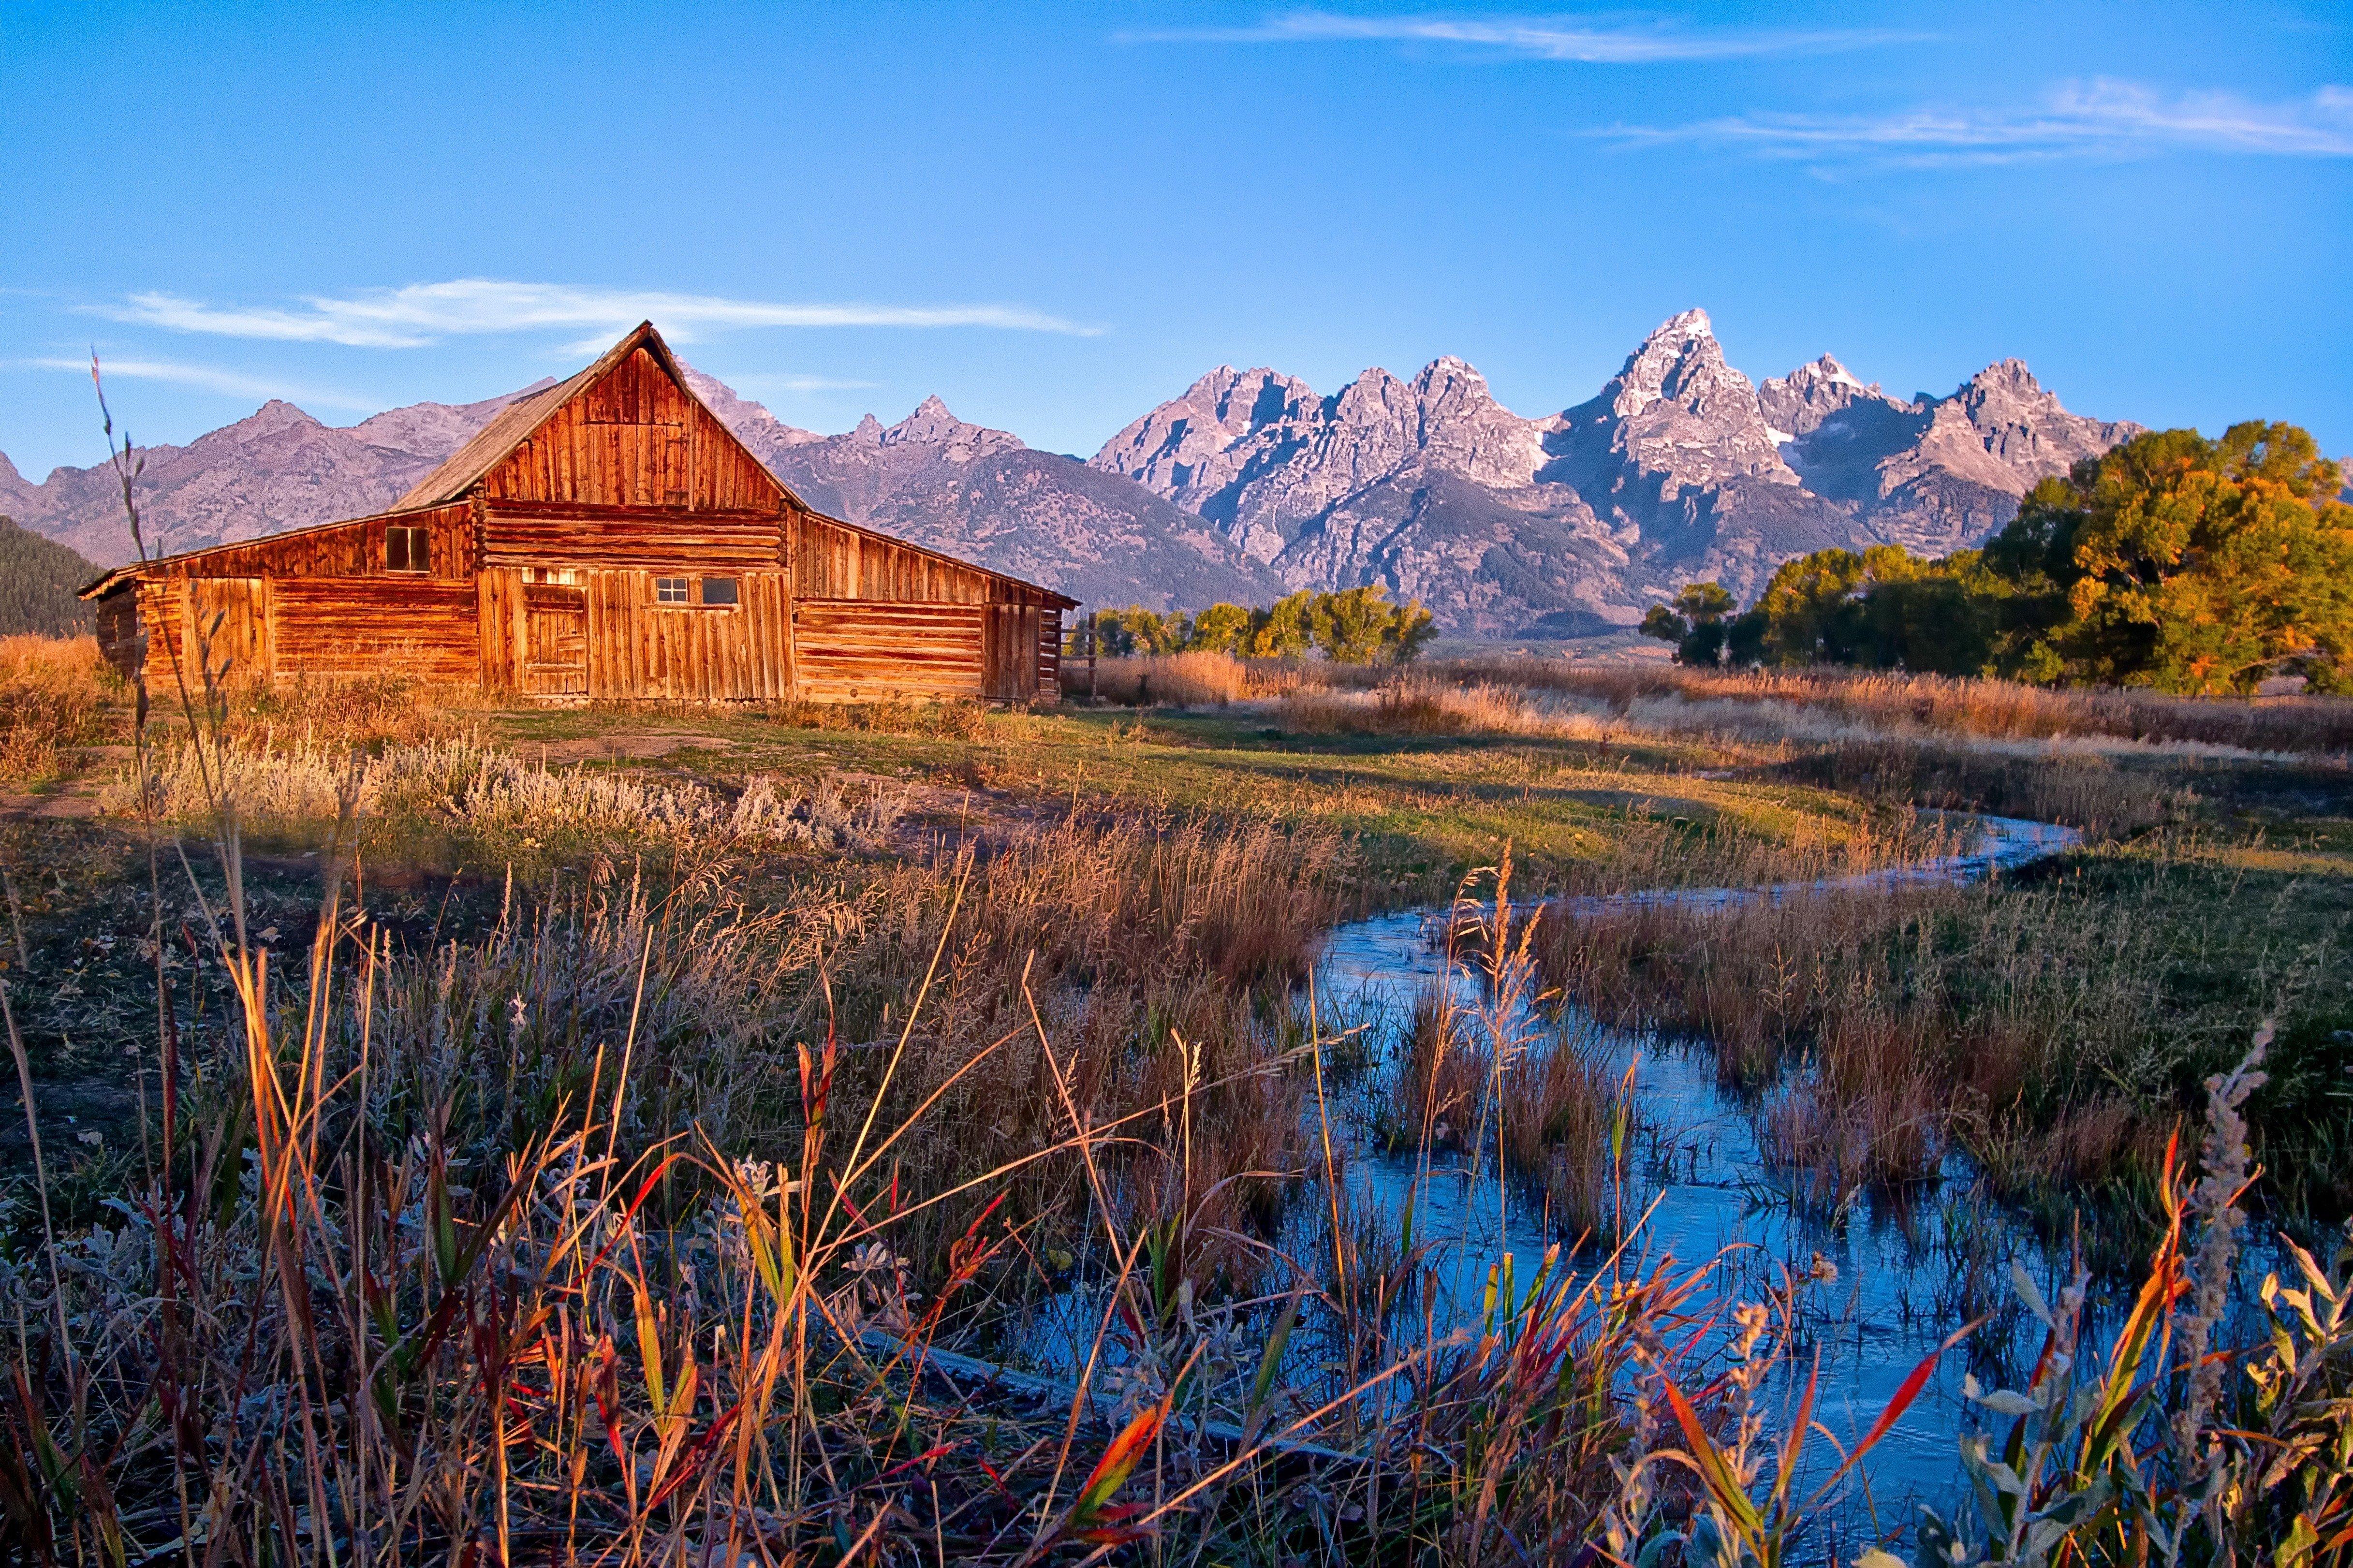 Mormon Row Grand Teton National Park Jackson Hole Wyoming USA barm 4866x3243